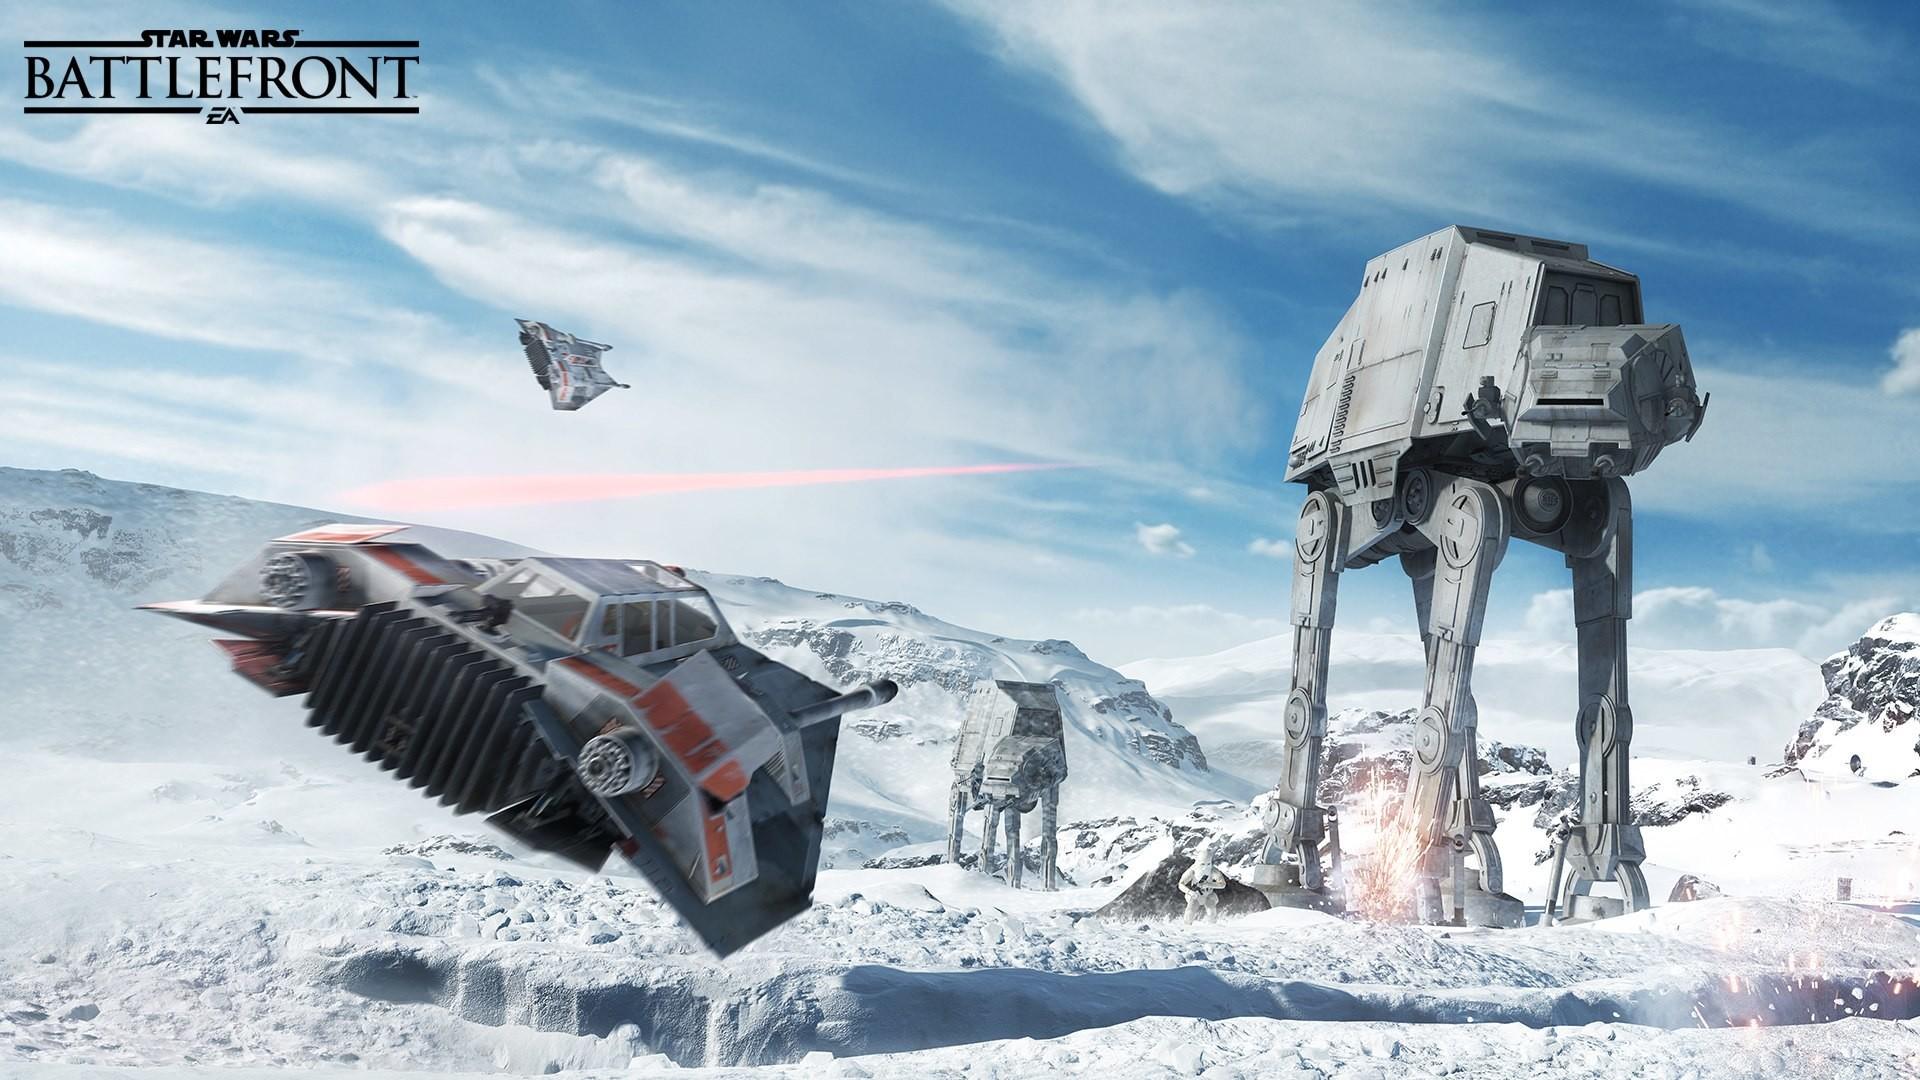 Star Wars Battlefront AT AT Wallpapers   HD Wallpapers